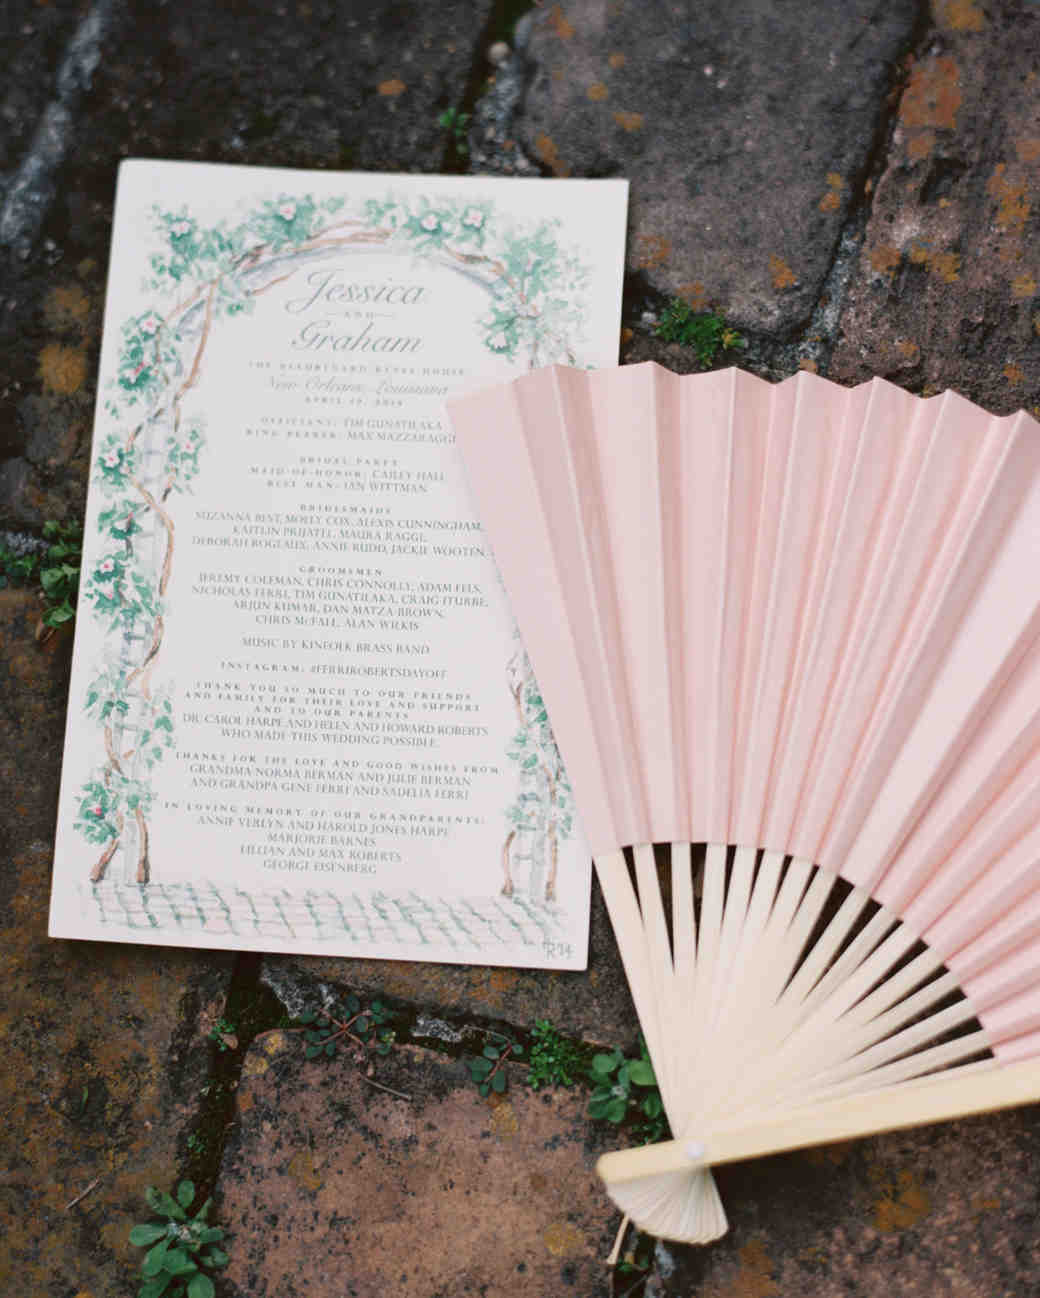 jessica-graham-wedding-program-0061-s112171-0915.jpg